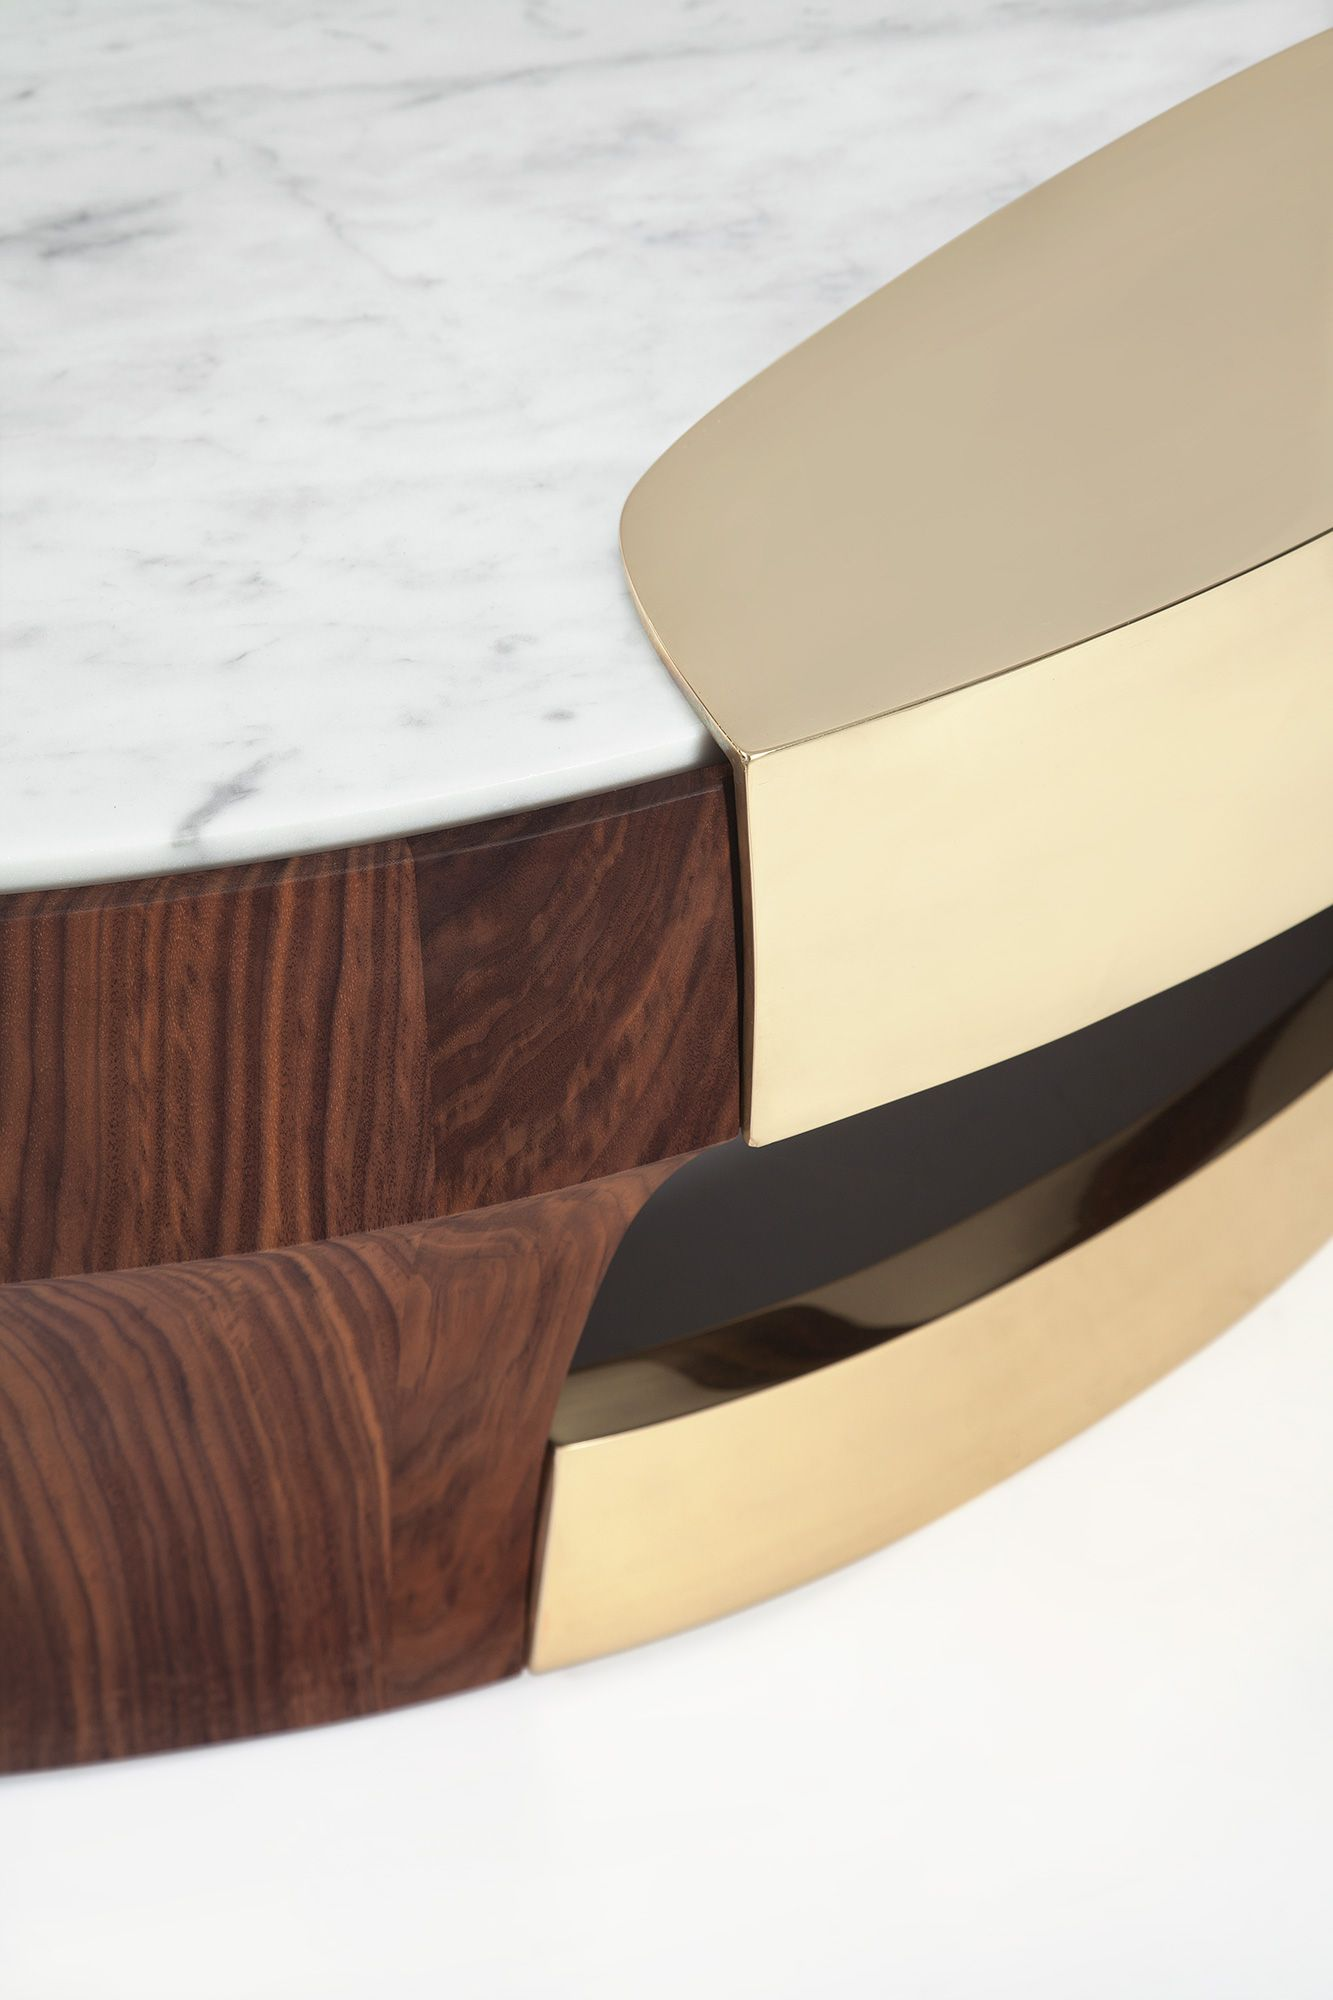 Salish Cocktail Table - CASTE Design